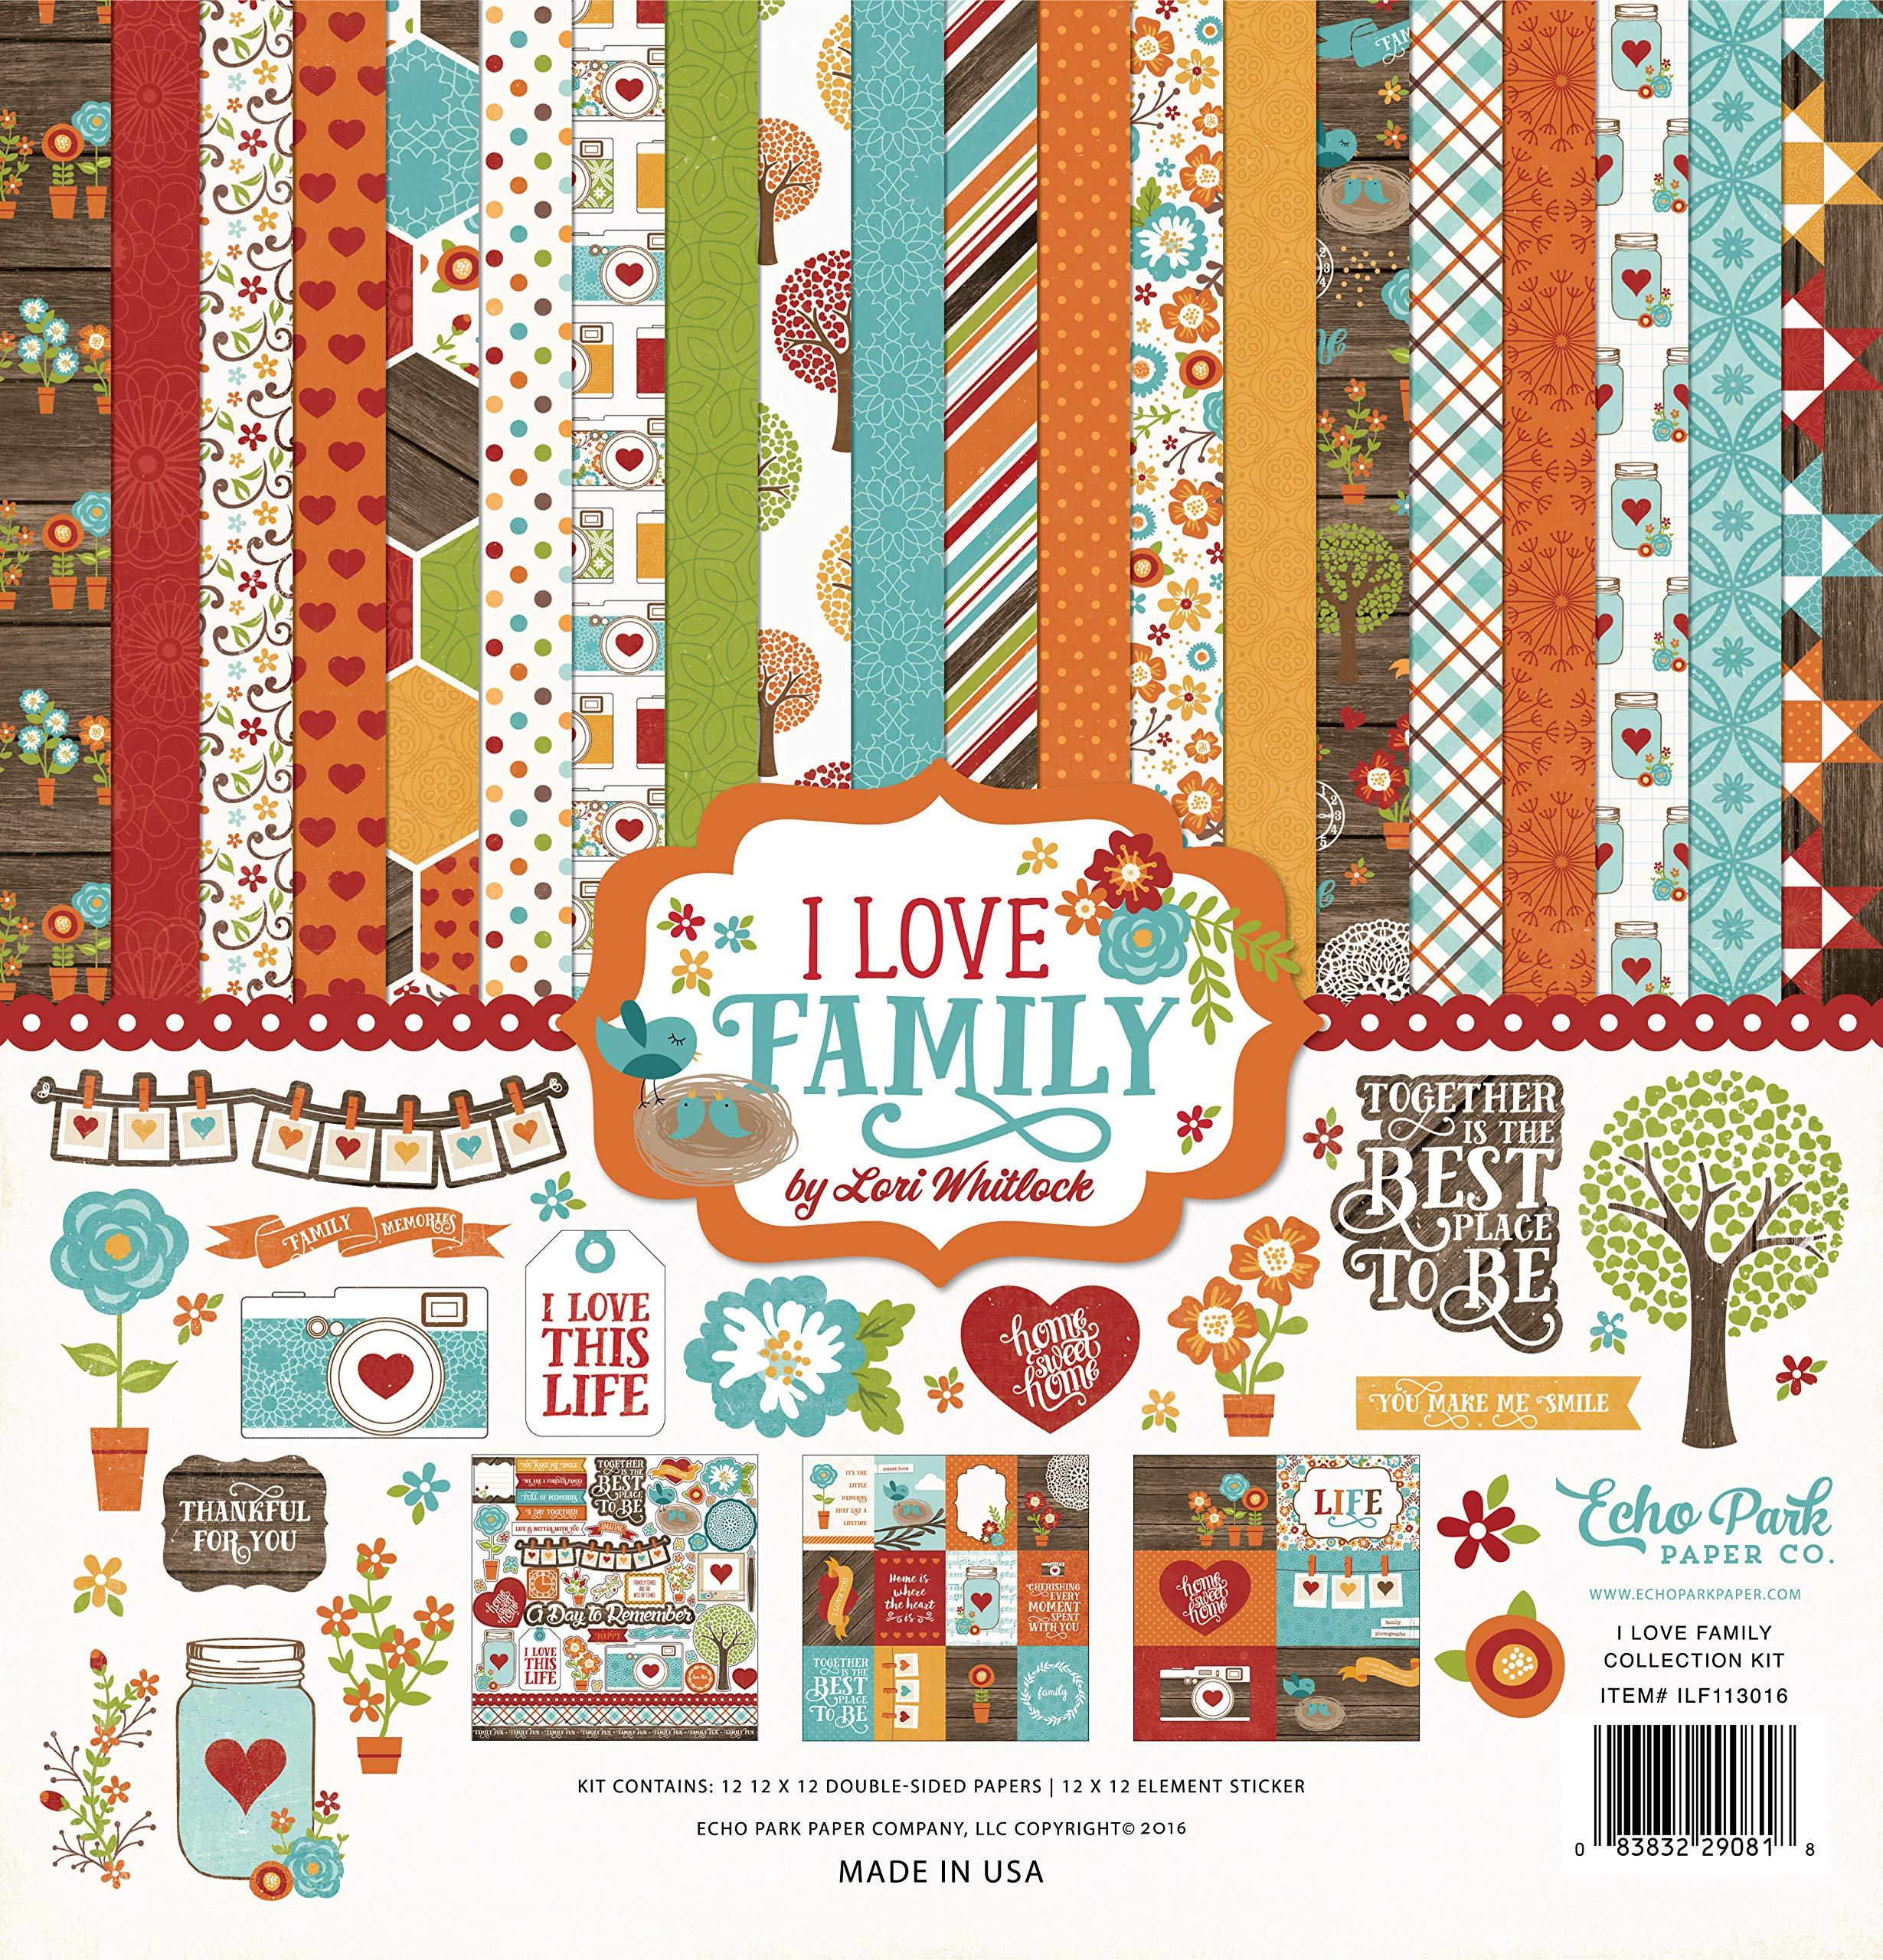 Echo Park Paper Company I I Love Family Collection Kit